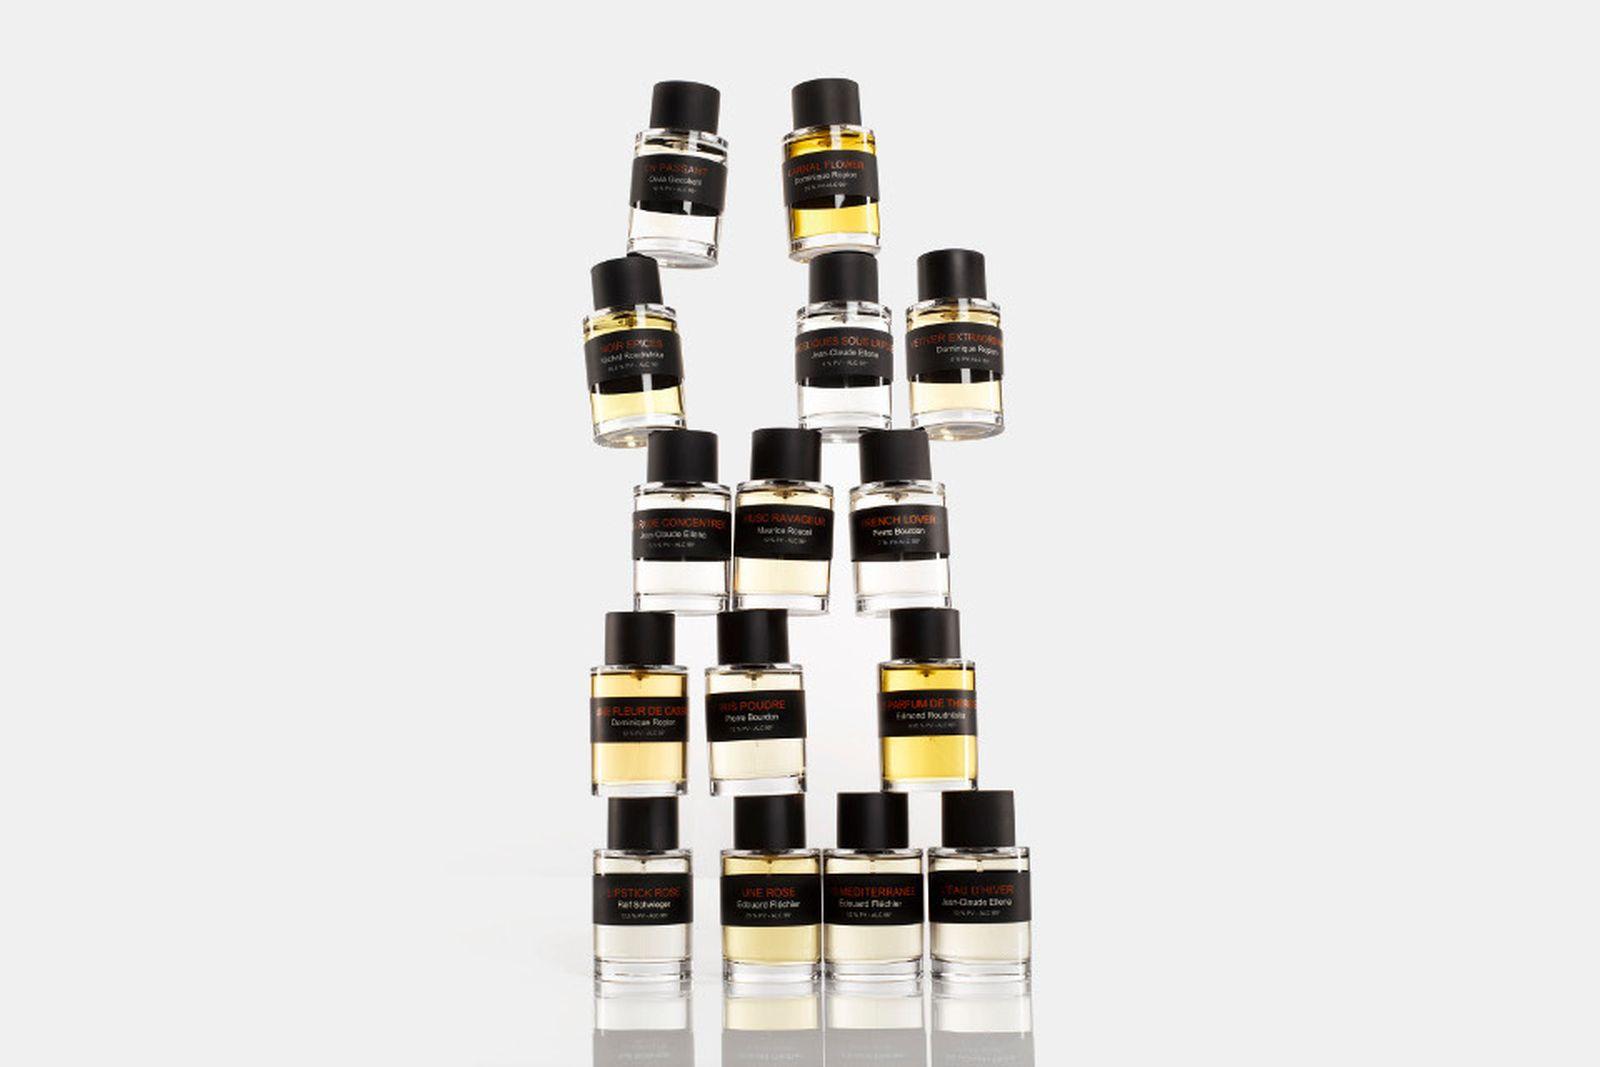 perfume brand frederic malle Annick Goutal Arquiste CB I Hate Perfume